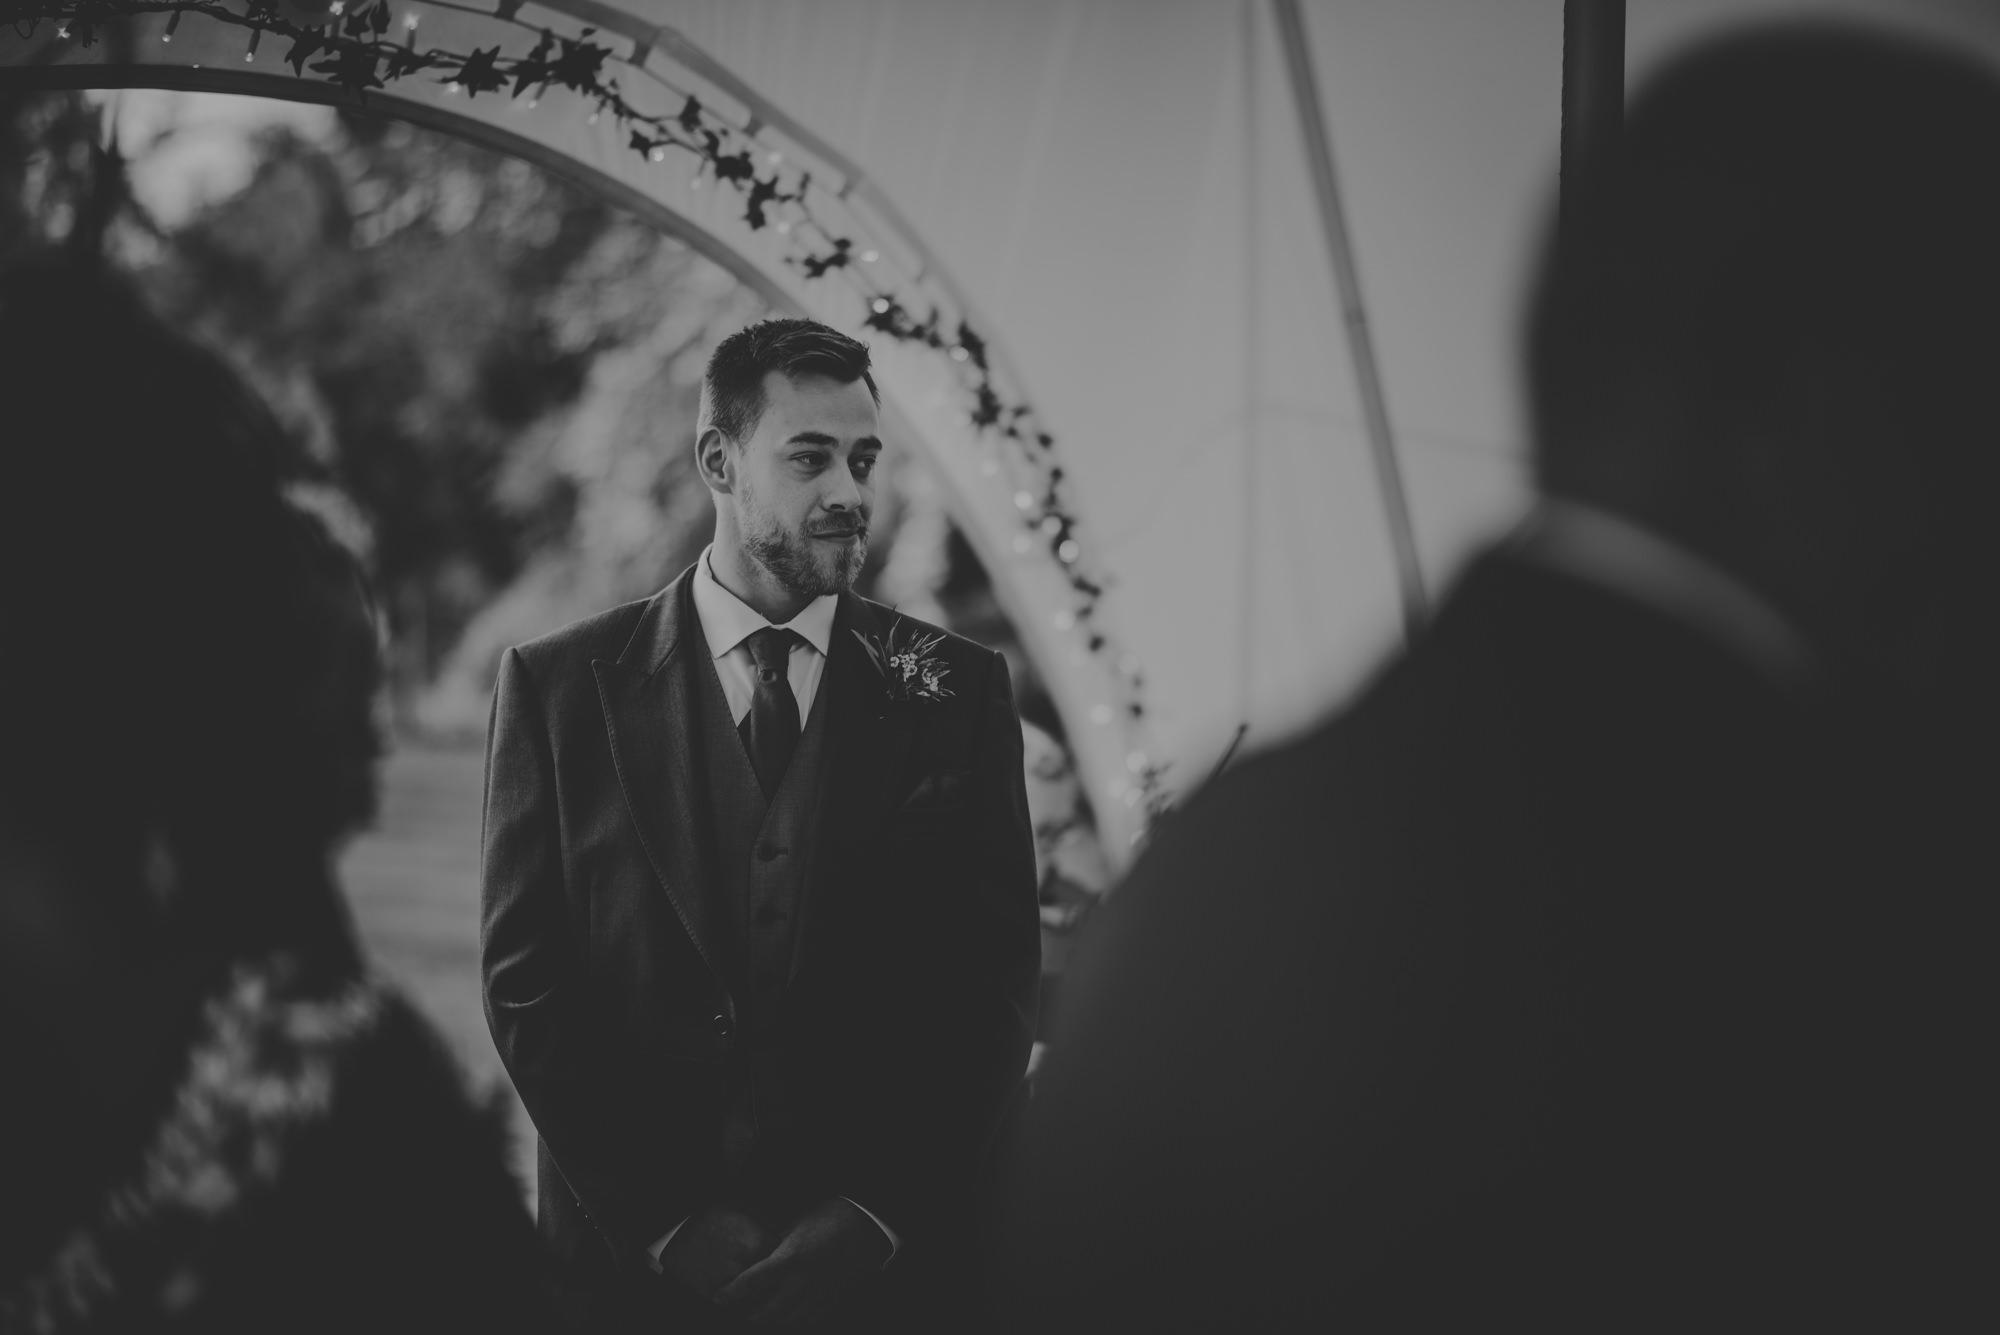 Jacqueline-Gareth-Wedding-Westmead-Events-Surrey-Manu-Mendoza-Wedding-Photography-191.jpg